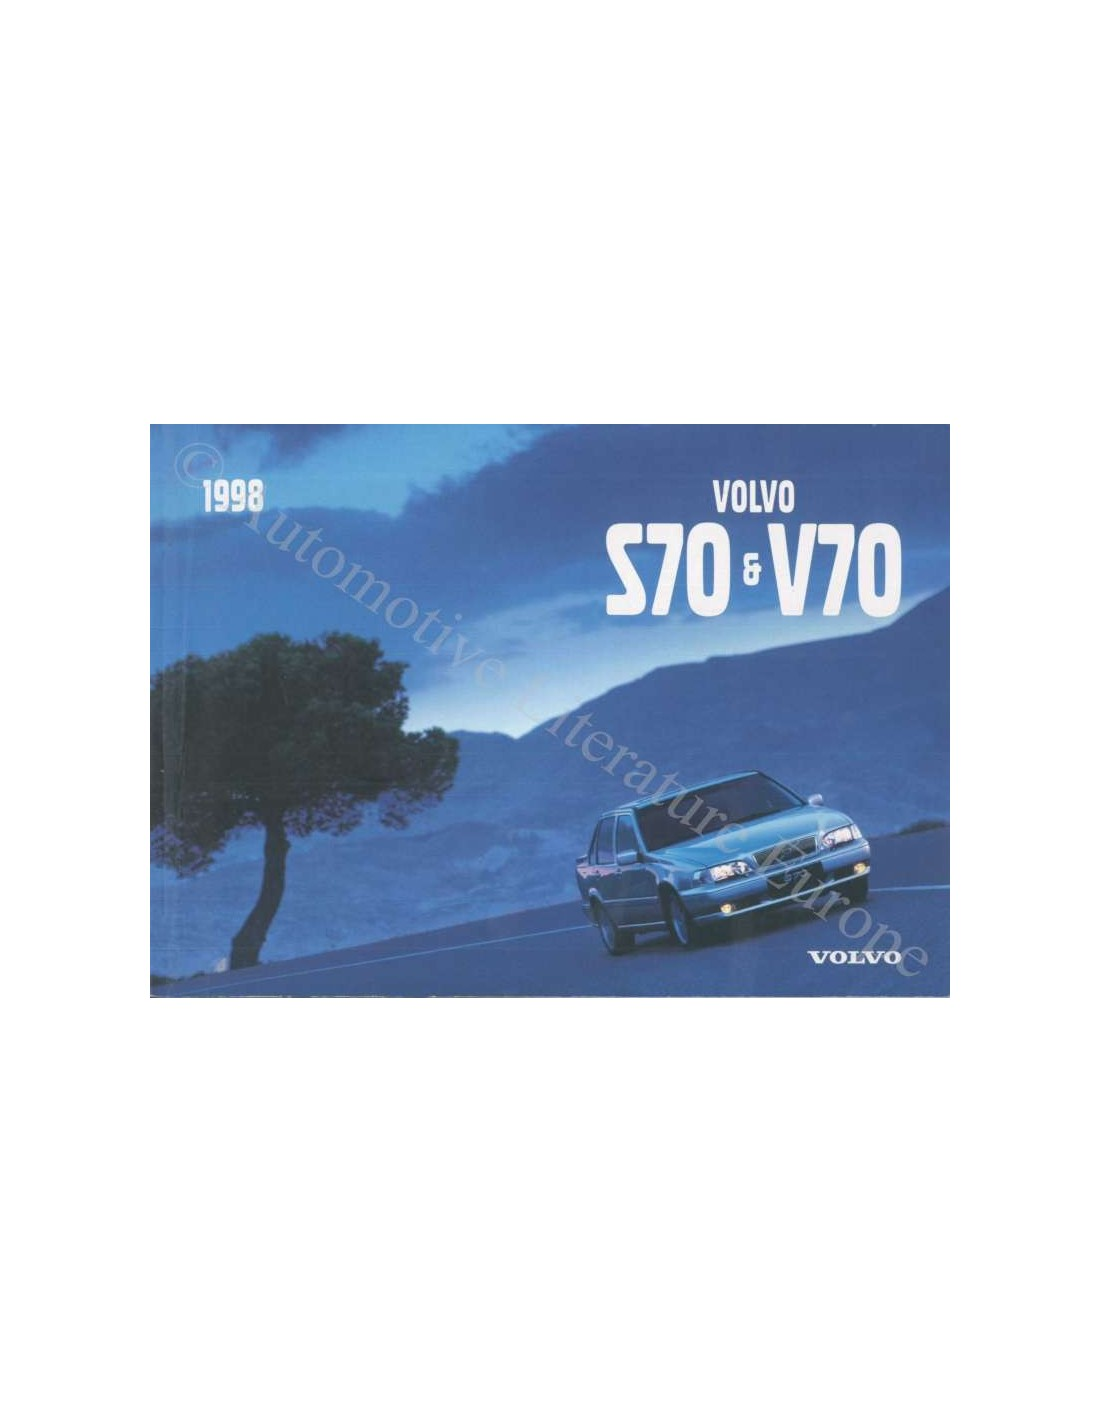 1998 volvo s70 v70 owner s manual german rh autolit eu Volvo V40 volvo s70 v70 owners manual